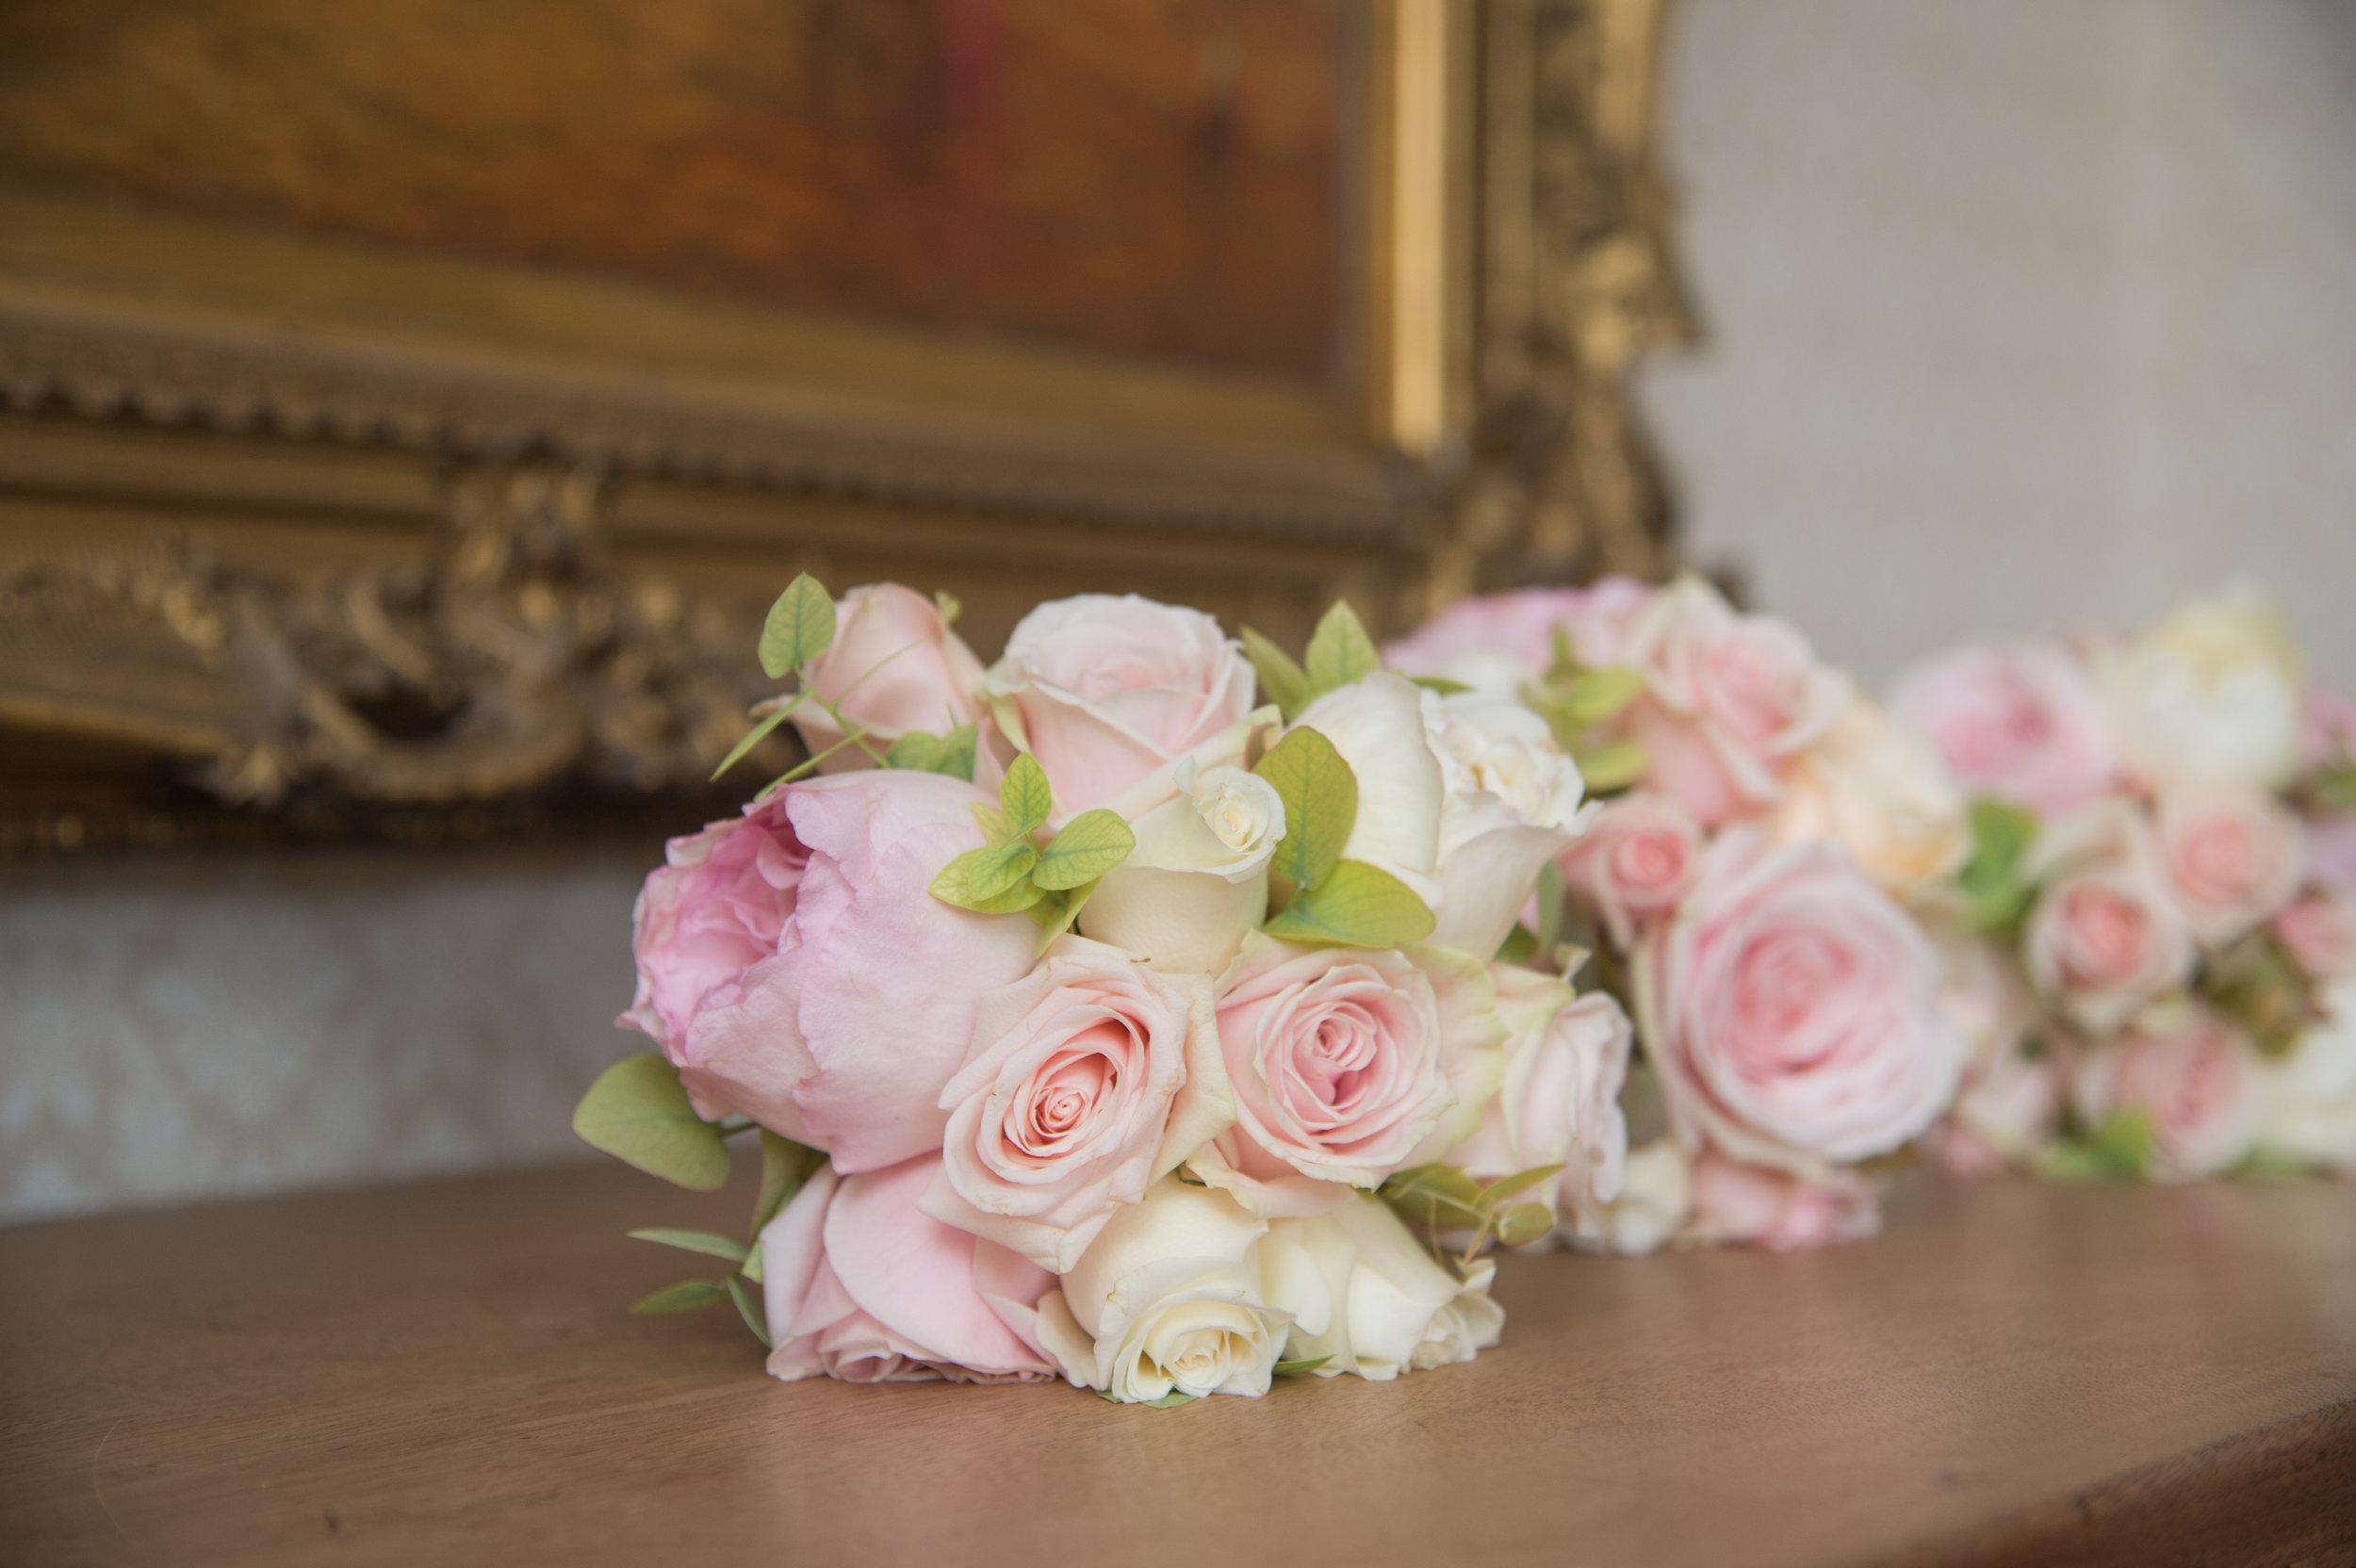 Wedding bouquets at Highbury Hall Birmingham